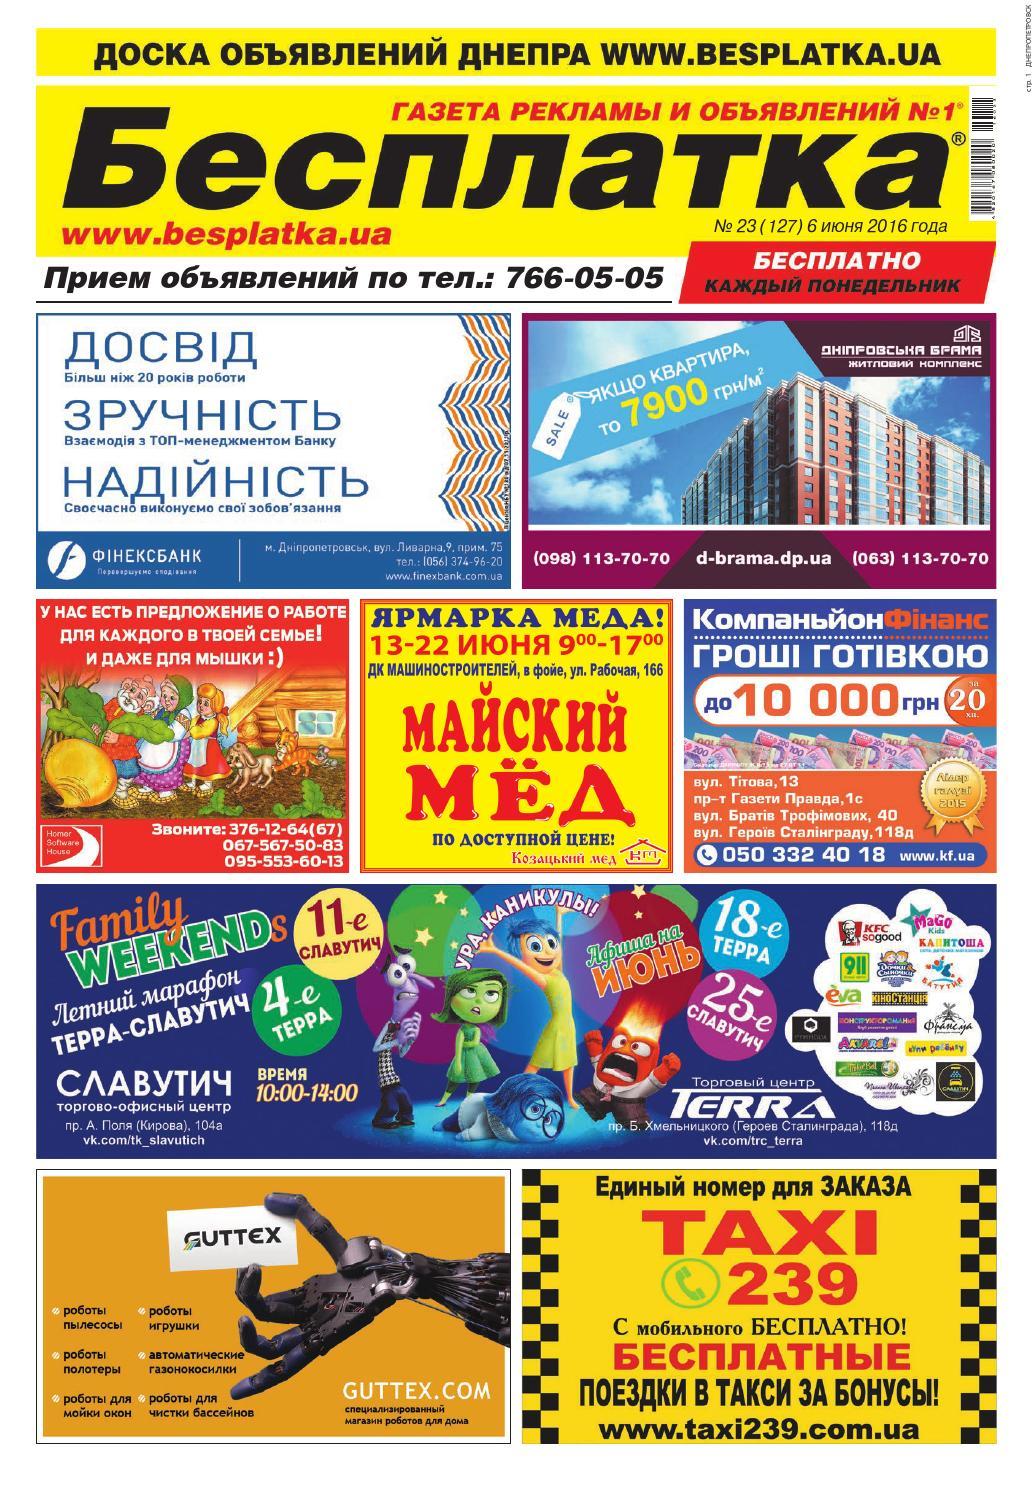 Besplatka  23 Днепр by besplatka ukraine - issuu a8f2efc57bb